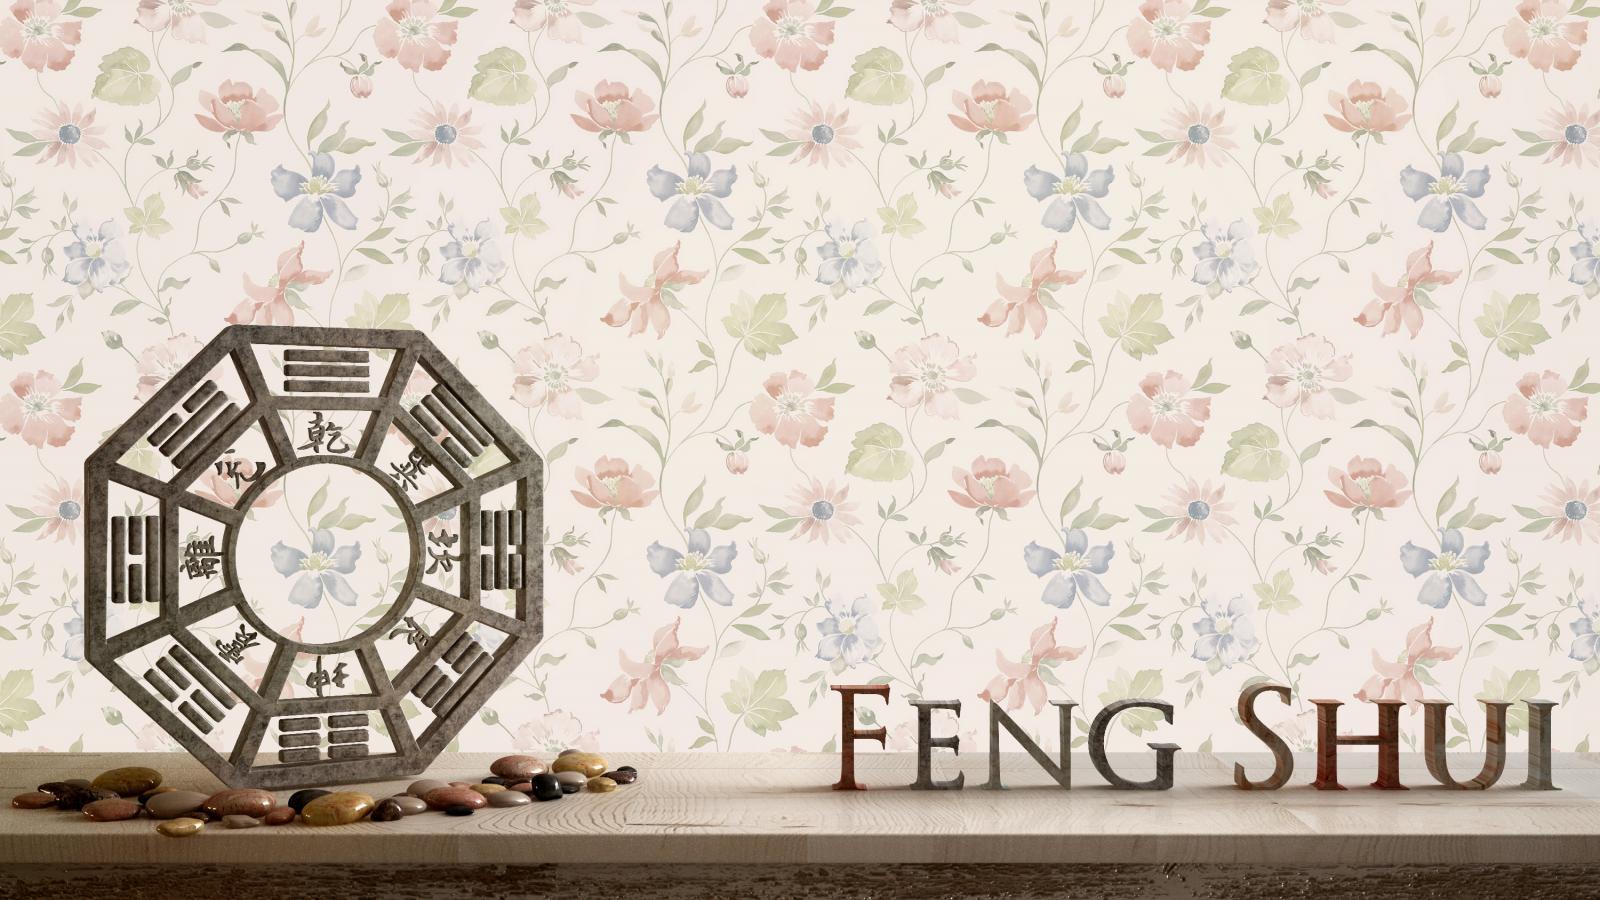 Esquina de la suerte feng shui